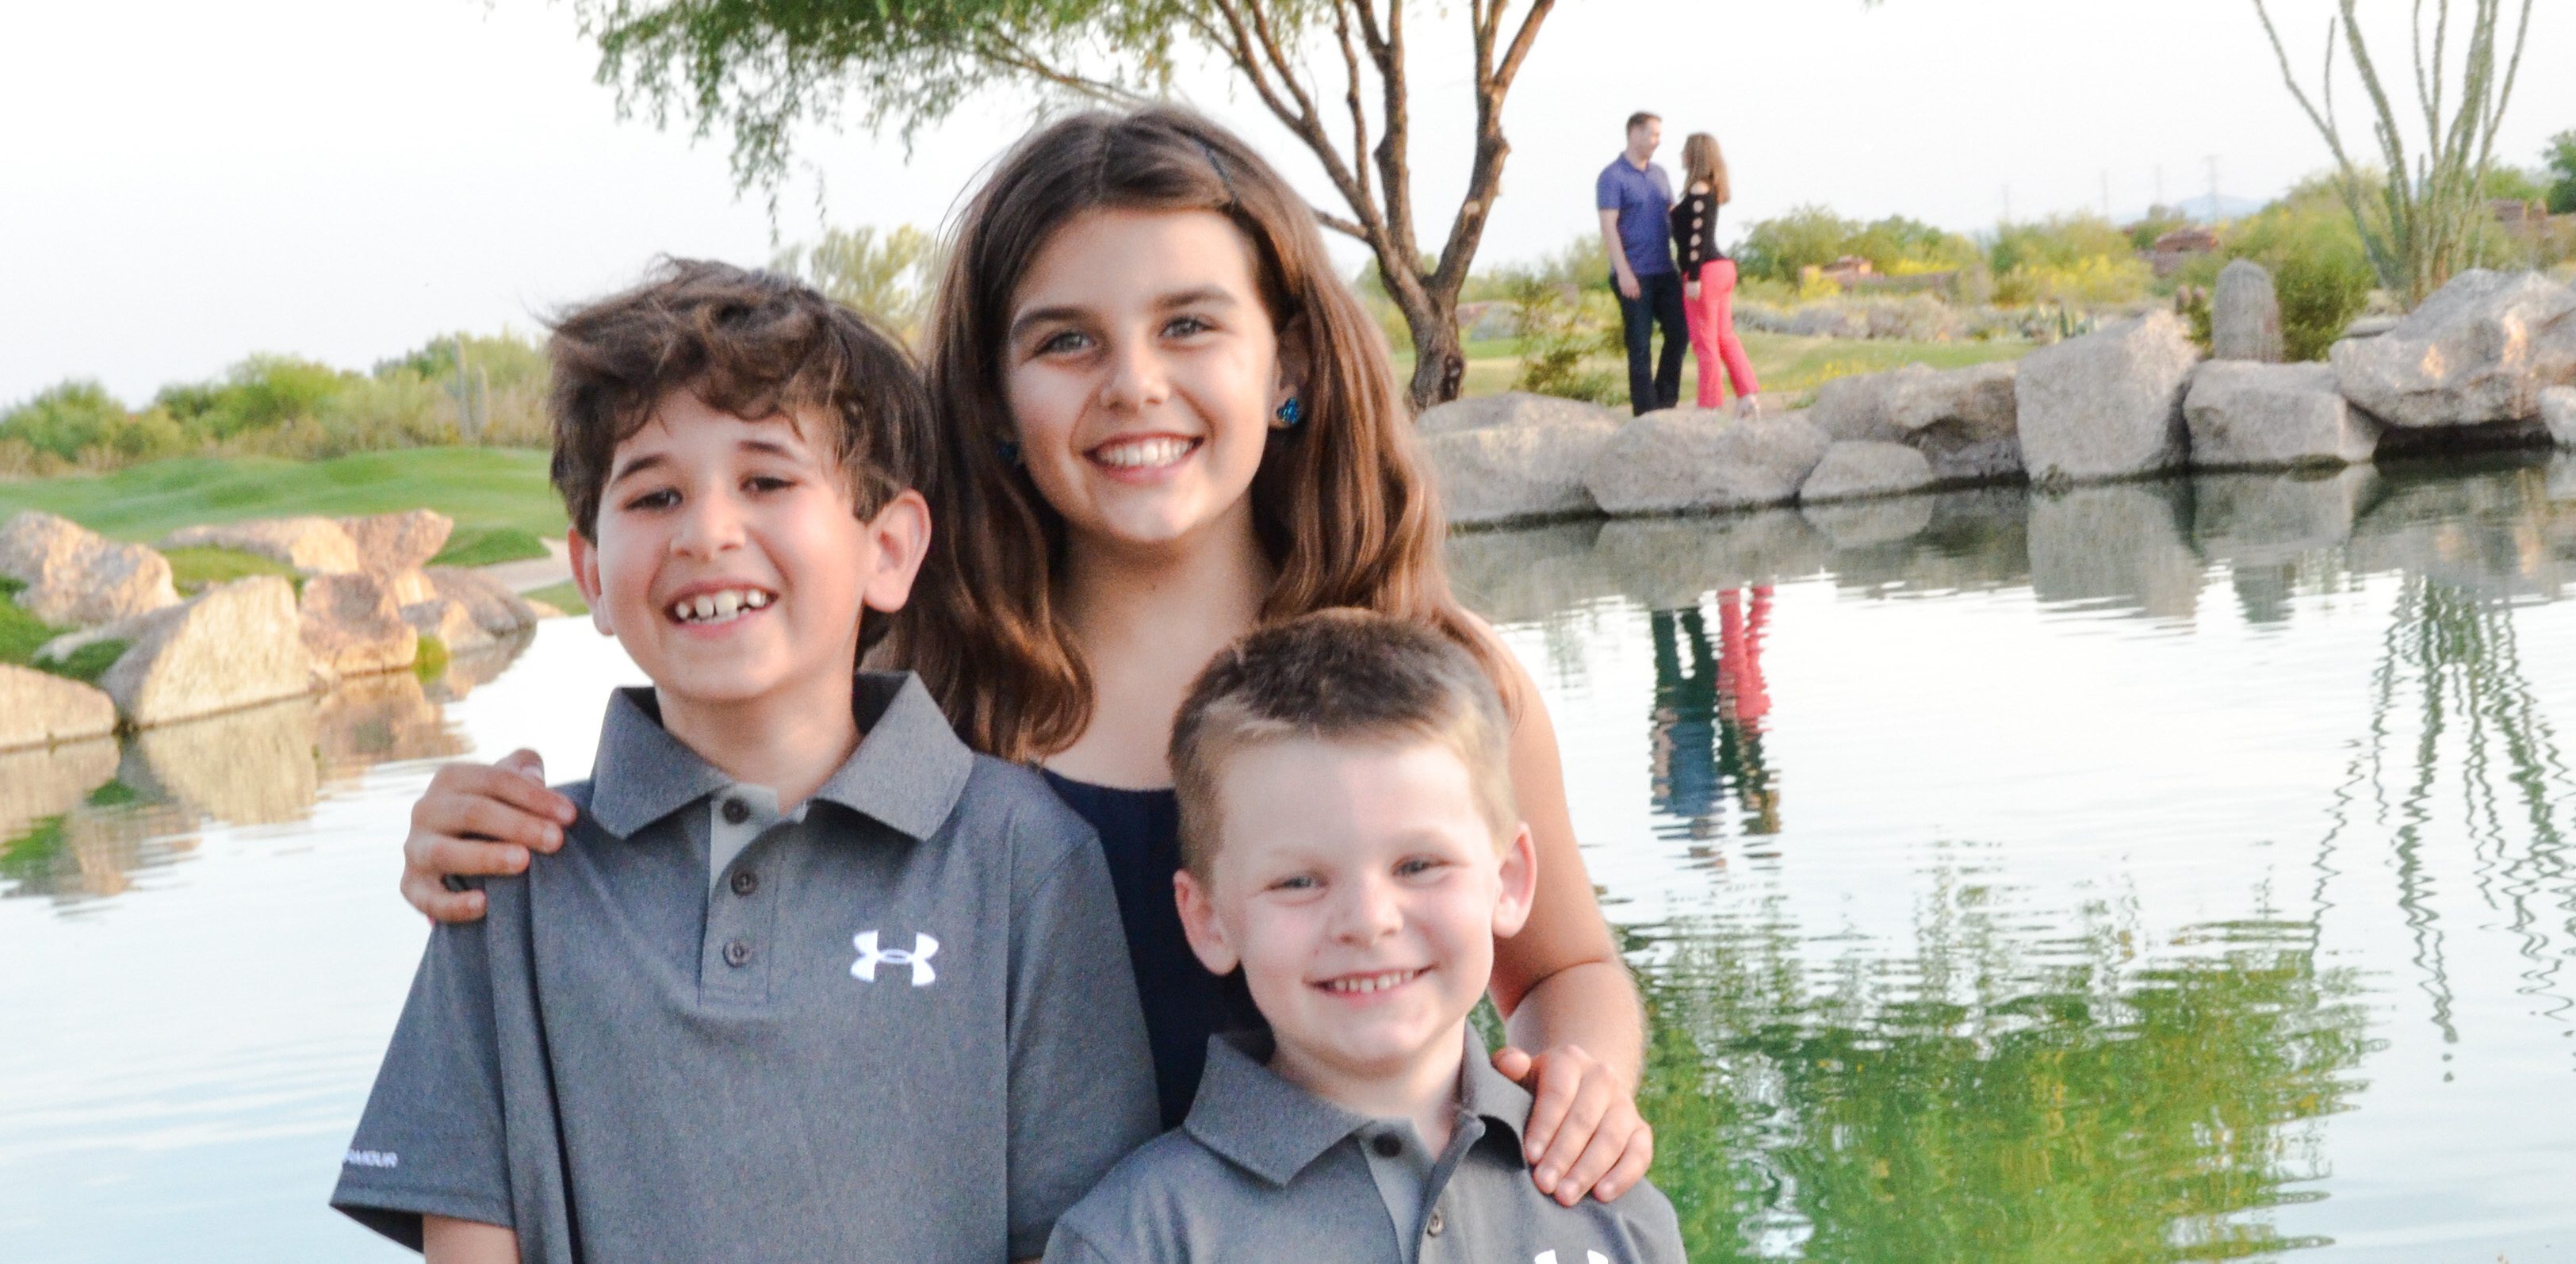 Maritess, Sean and Brady